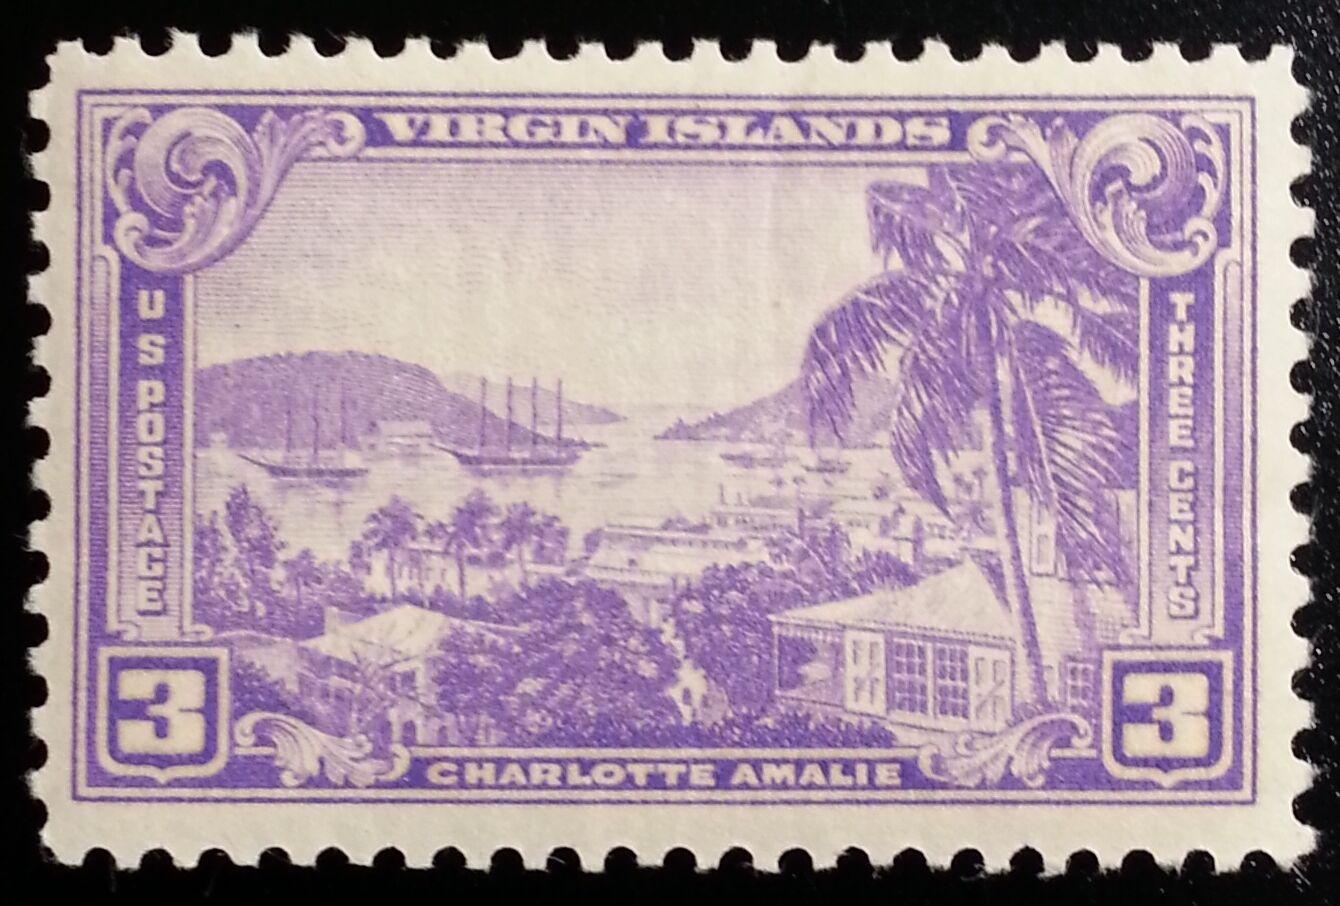 1938 3c Virgin Islands Territory, Charlotte Amalie Scot